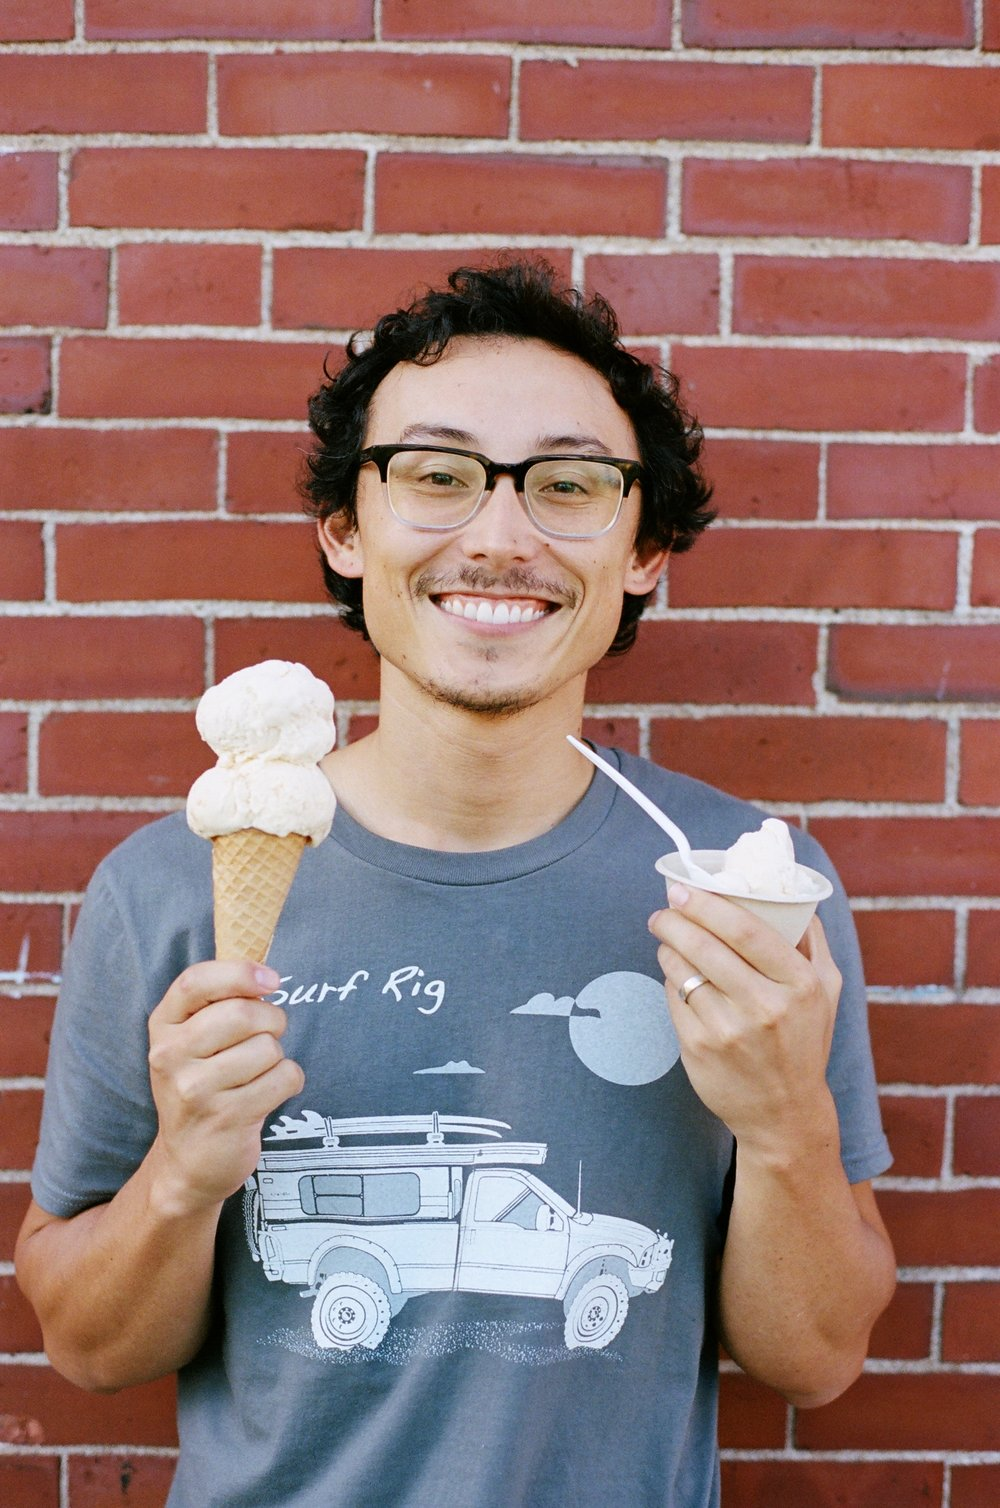 Owen enjoying ice cream